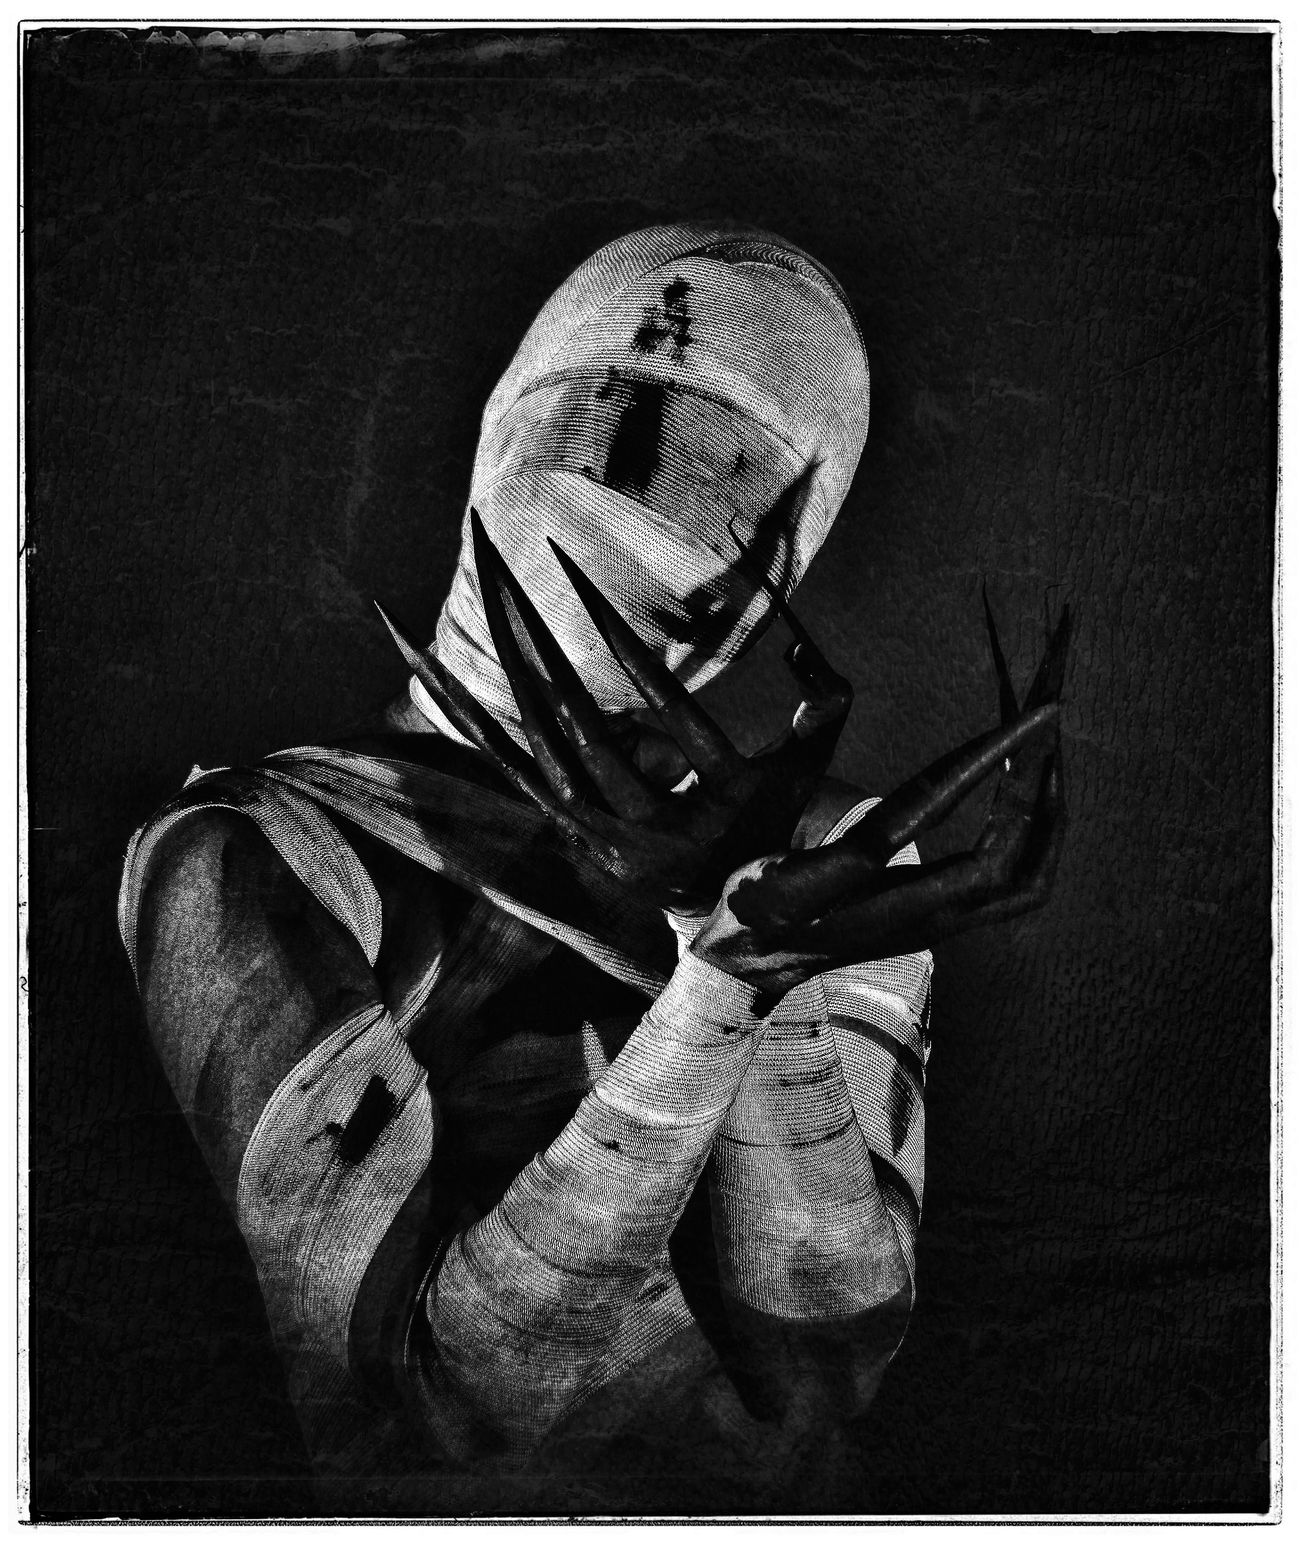 Monster Monster Creepy Self Portrait Blood Long Nails Black & White Bands Grunge